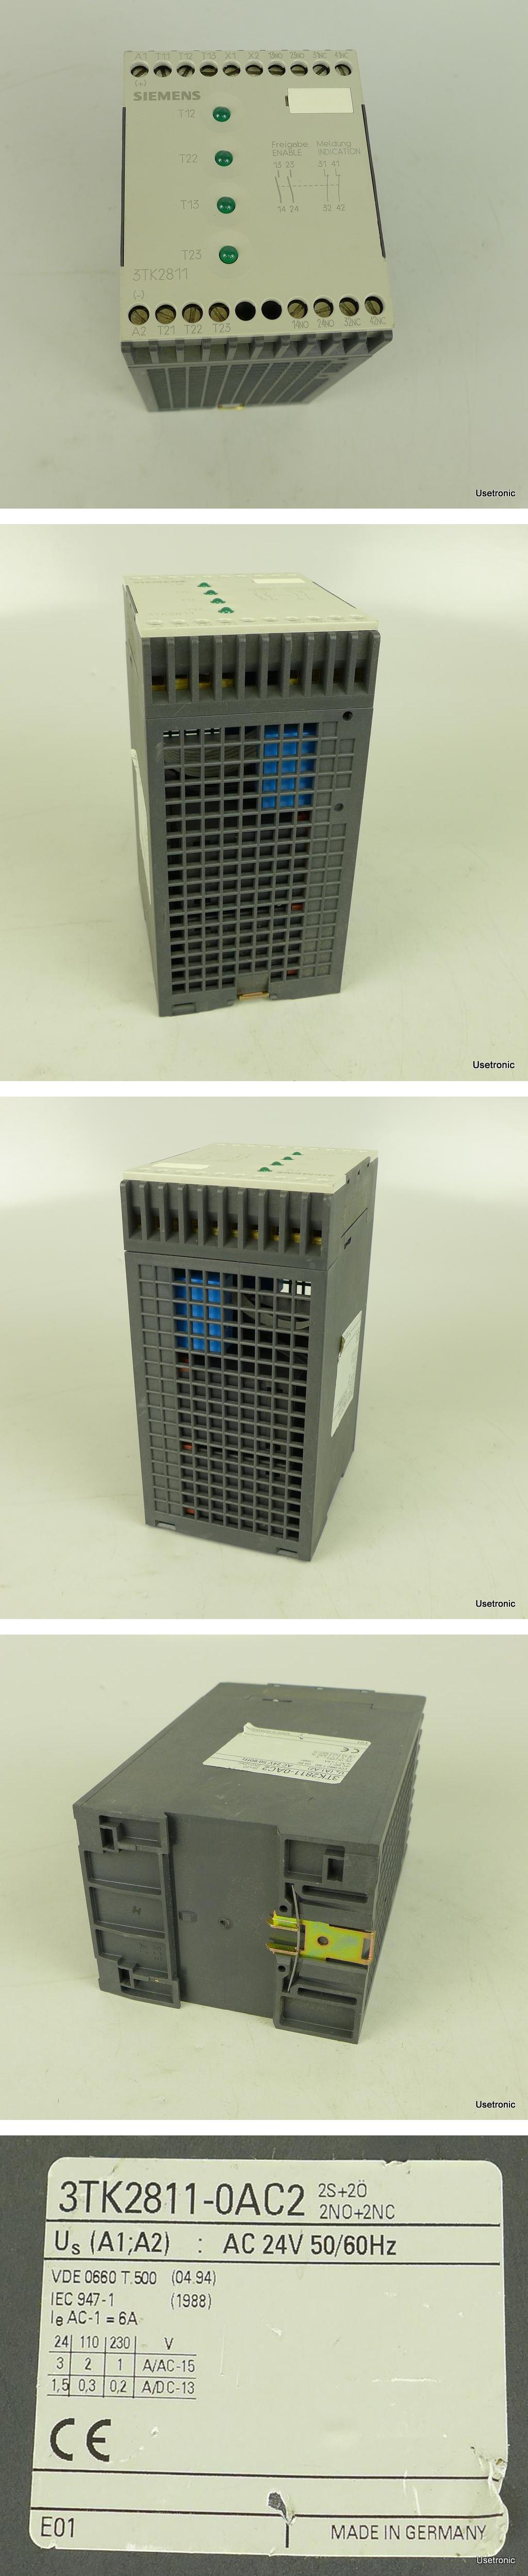 Siemens 3TK2811-0AC2